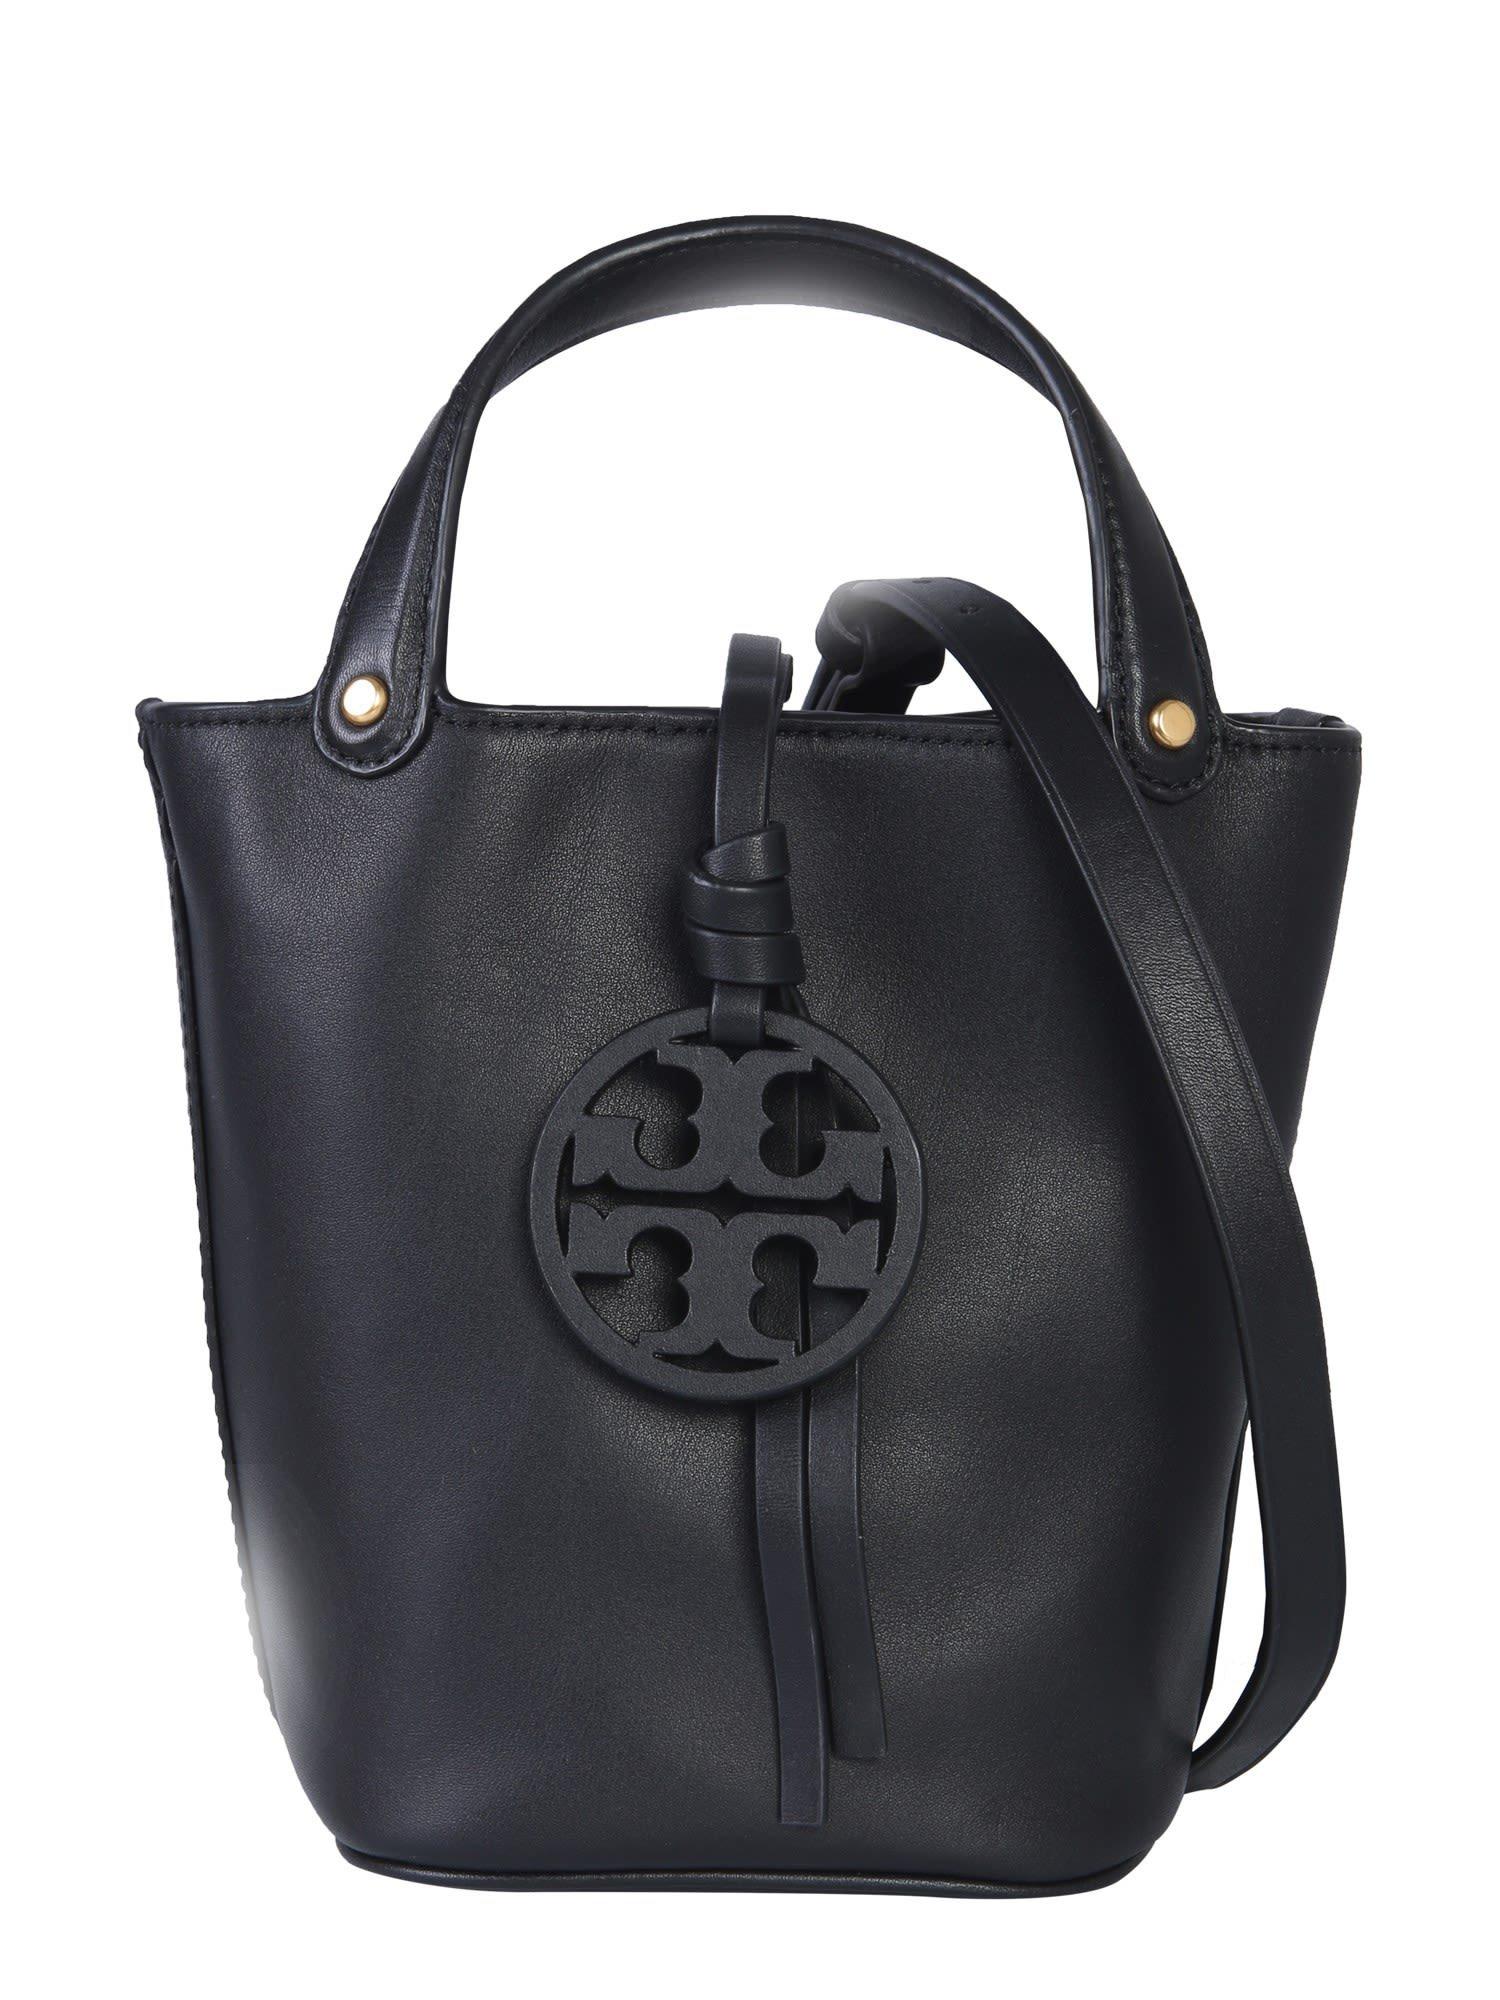 Tory Burch Mini Miller Bag